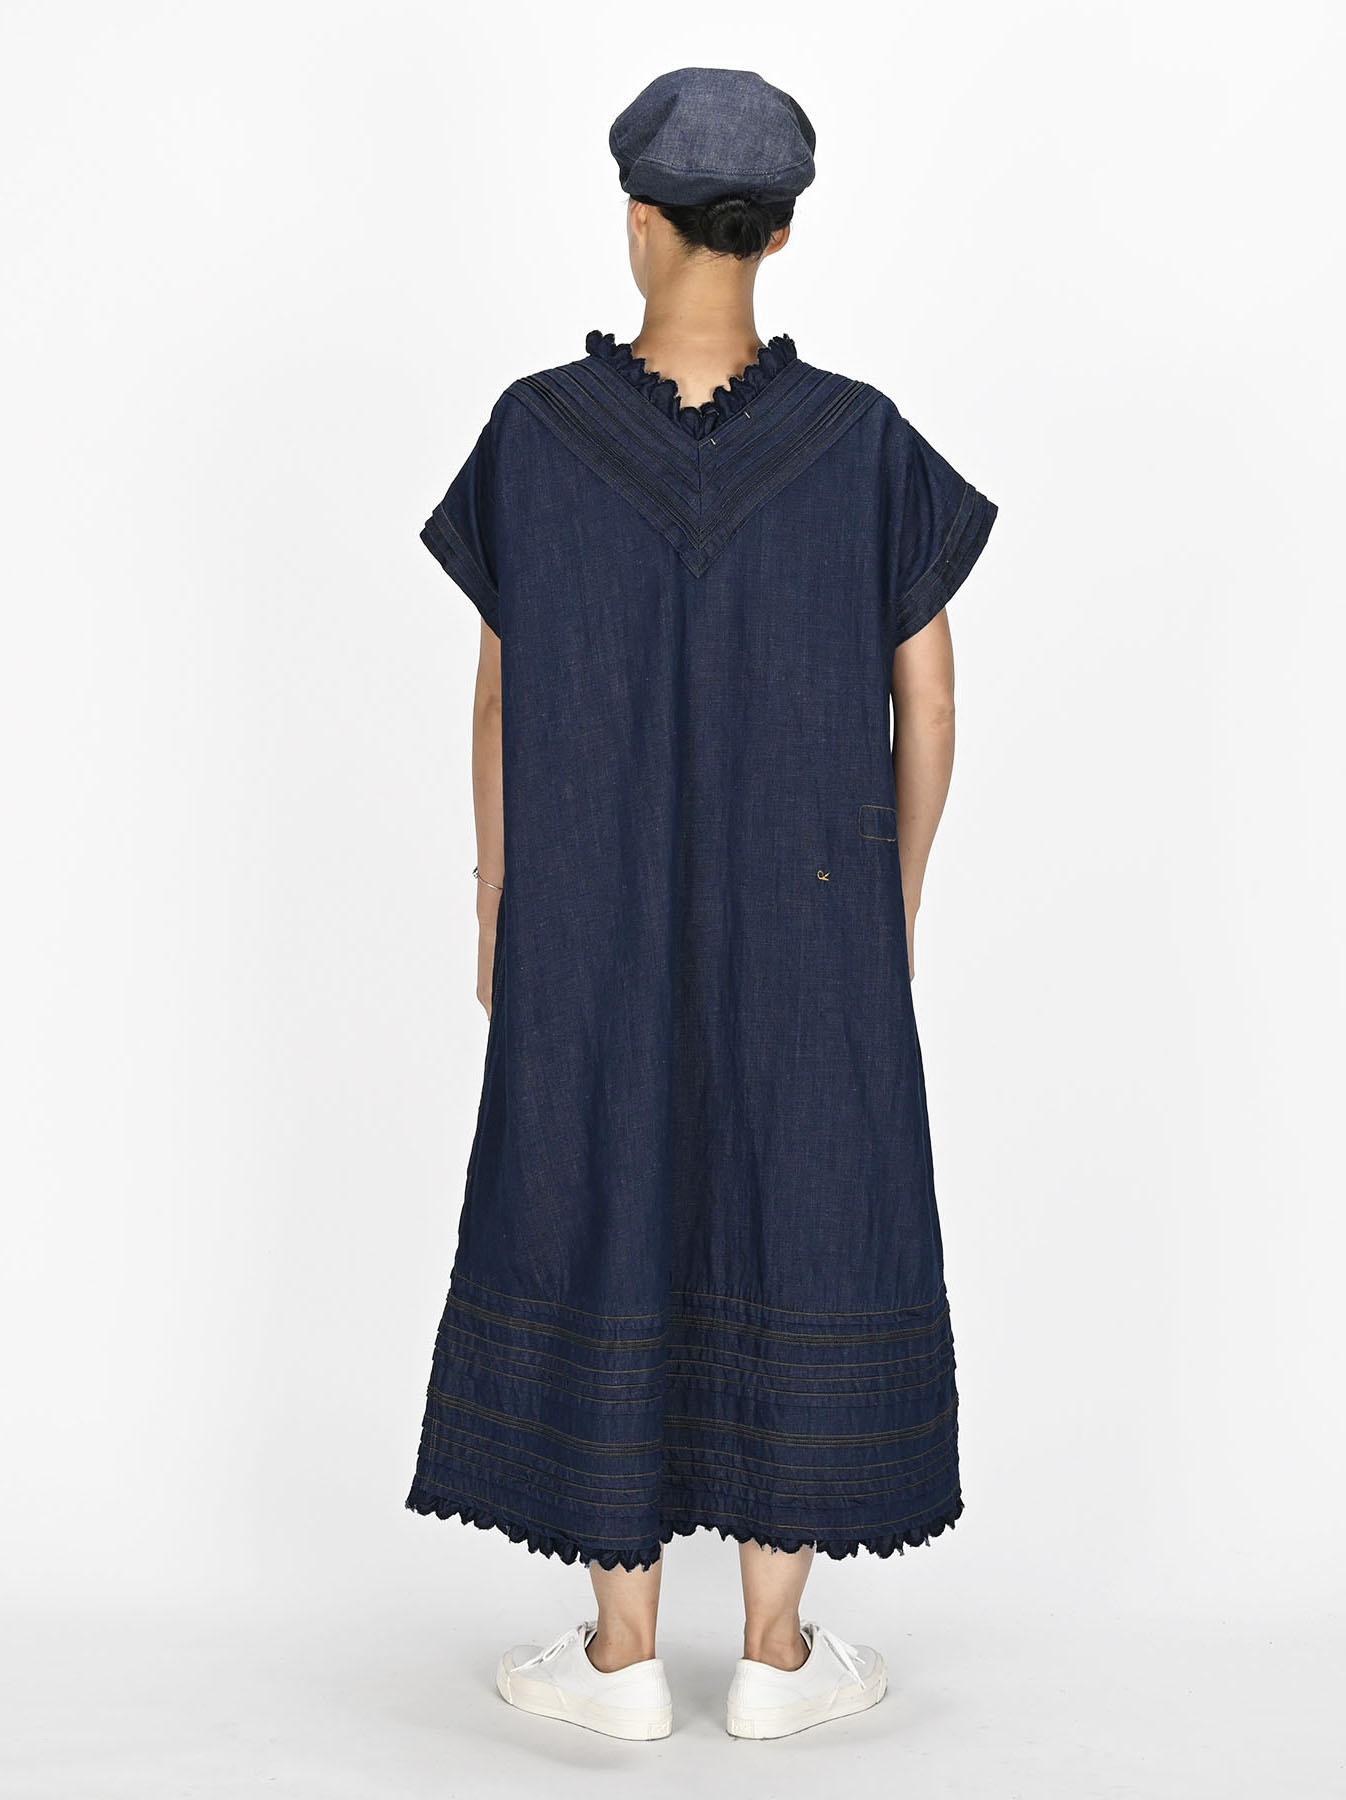 Komugi Denim Tuck Lace Dress-5